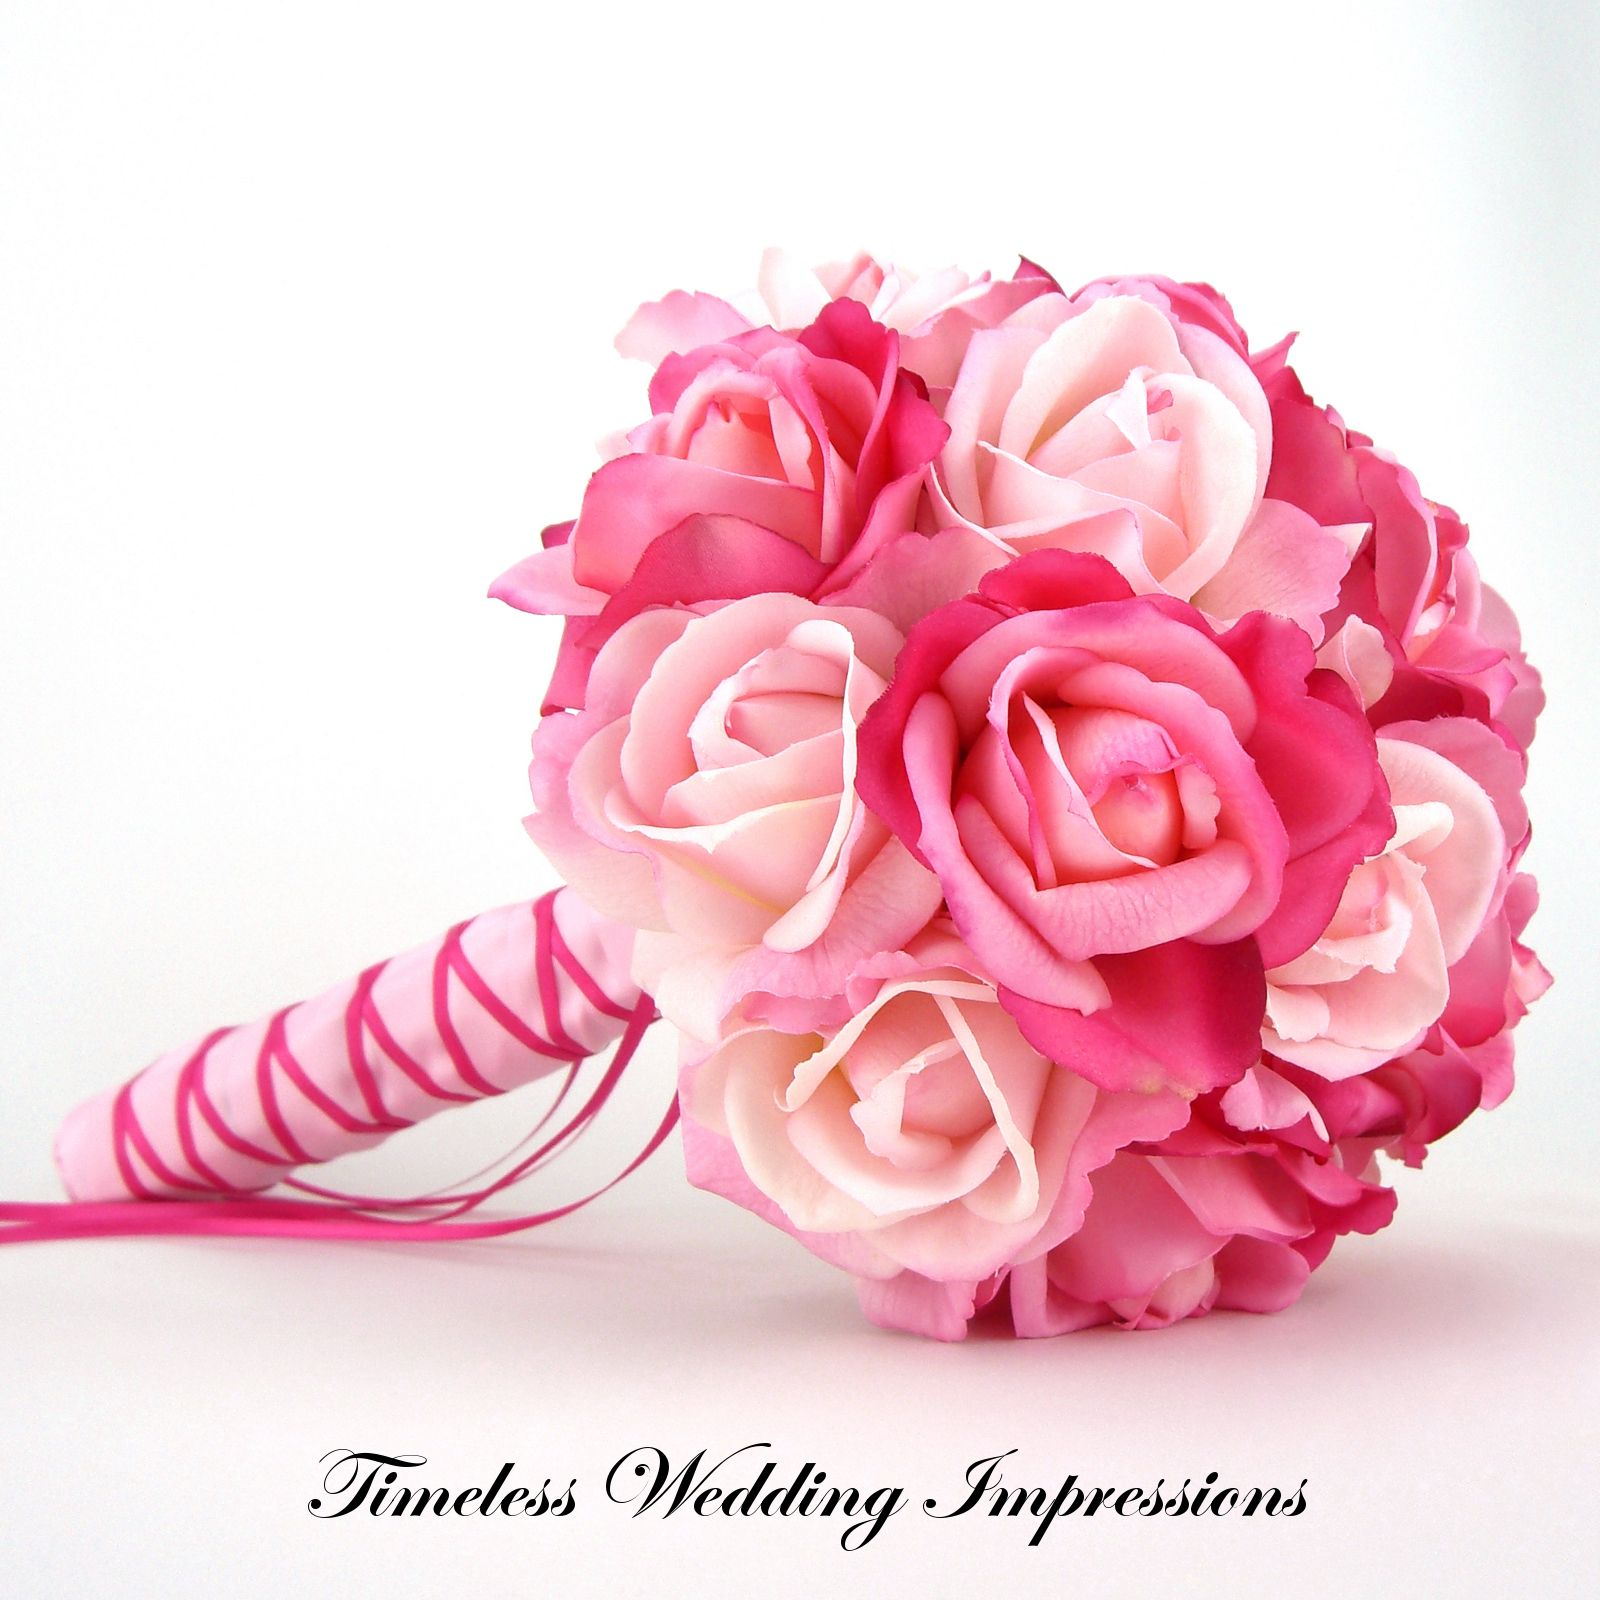 Online Flower Shop Flower Delivery Calgary Pinterest Wedding